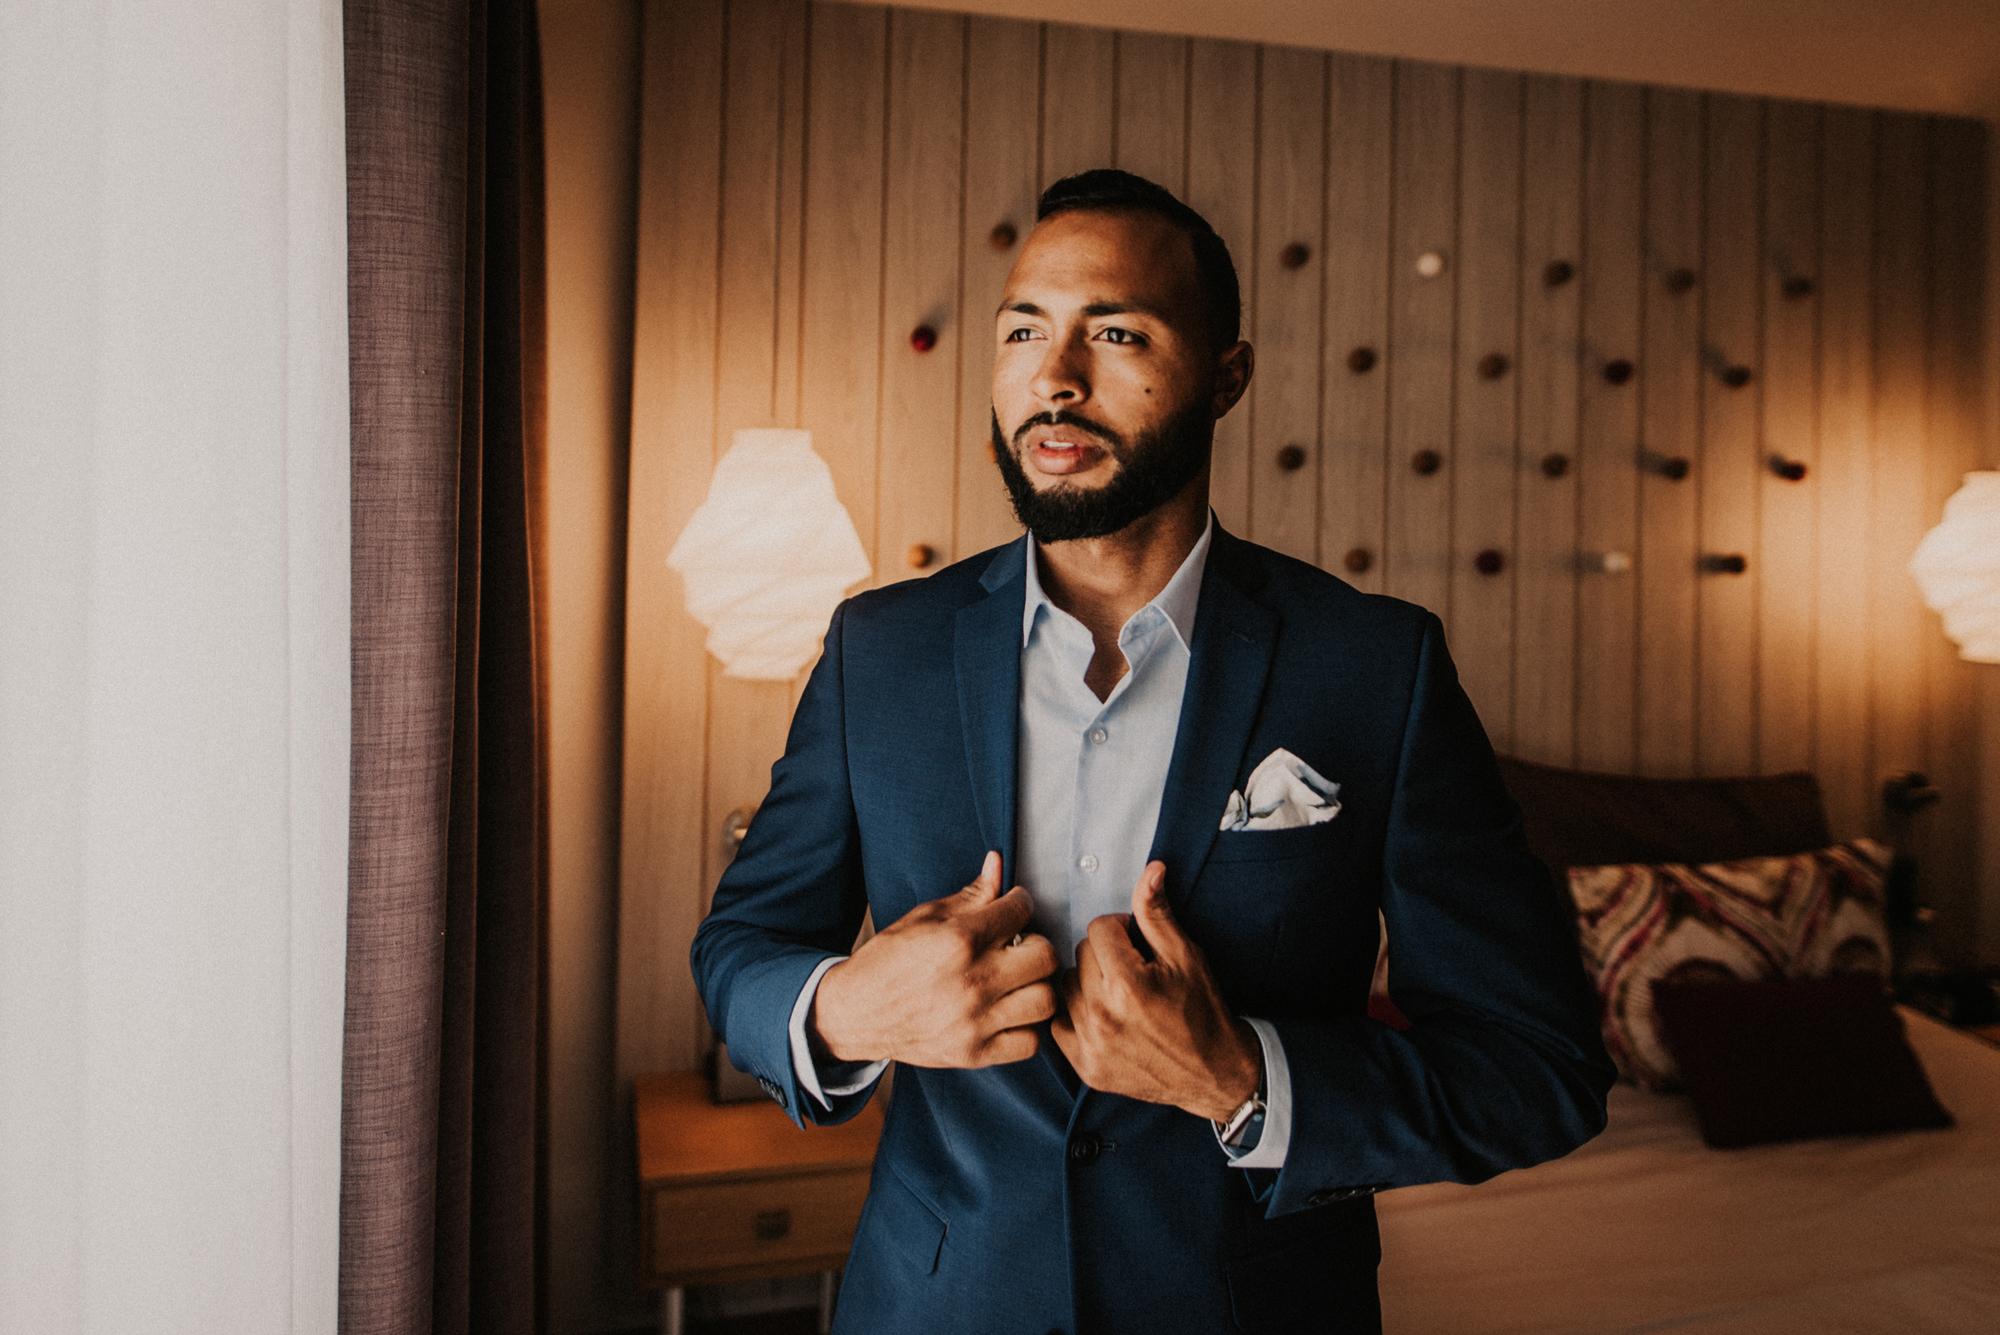 groom stands posing in blue suit